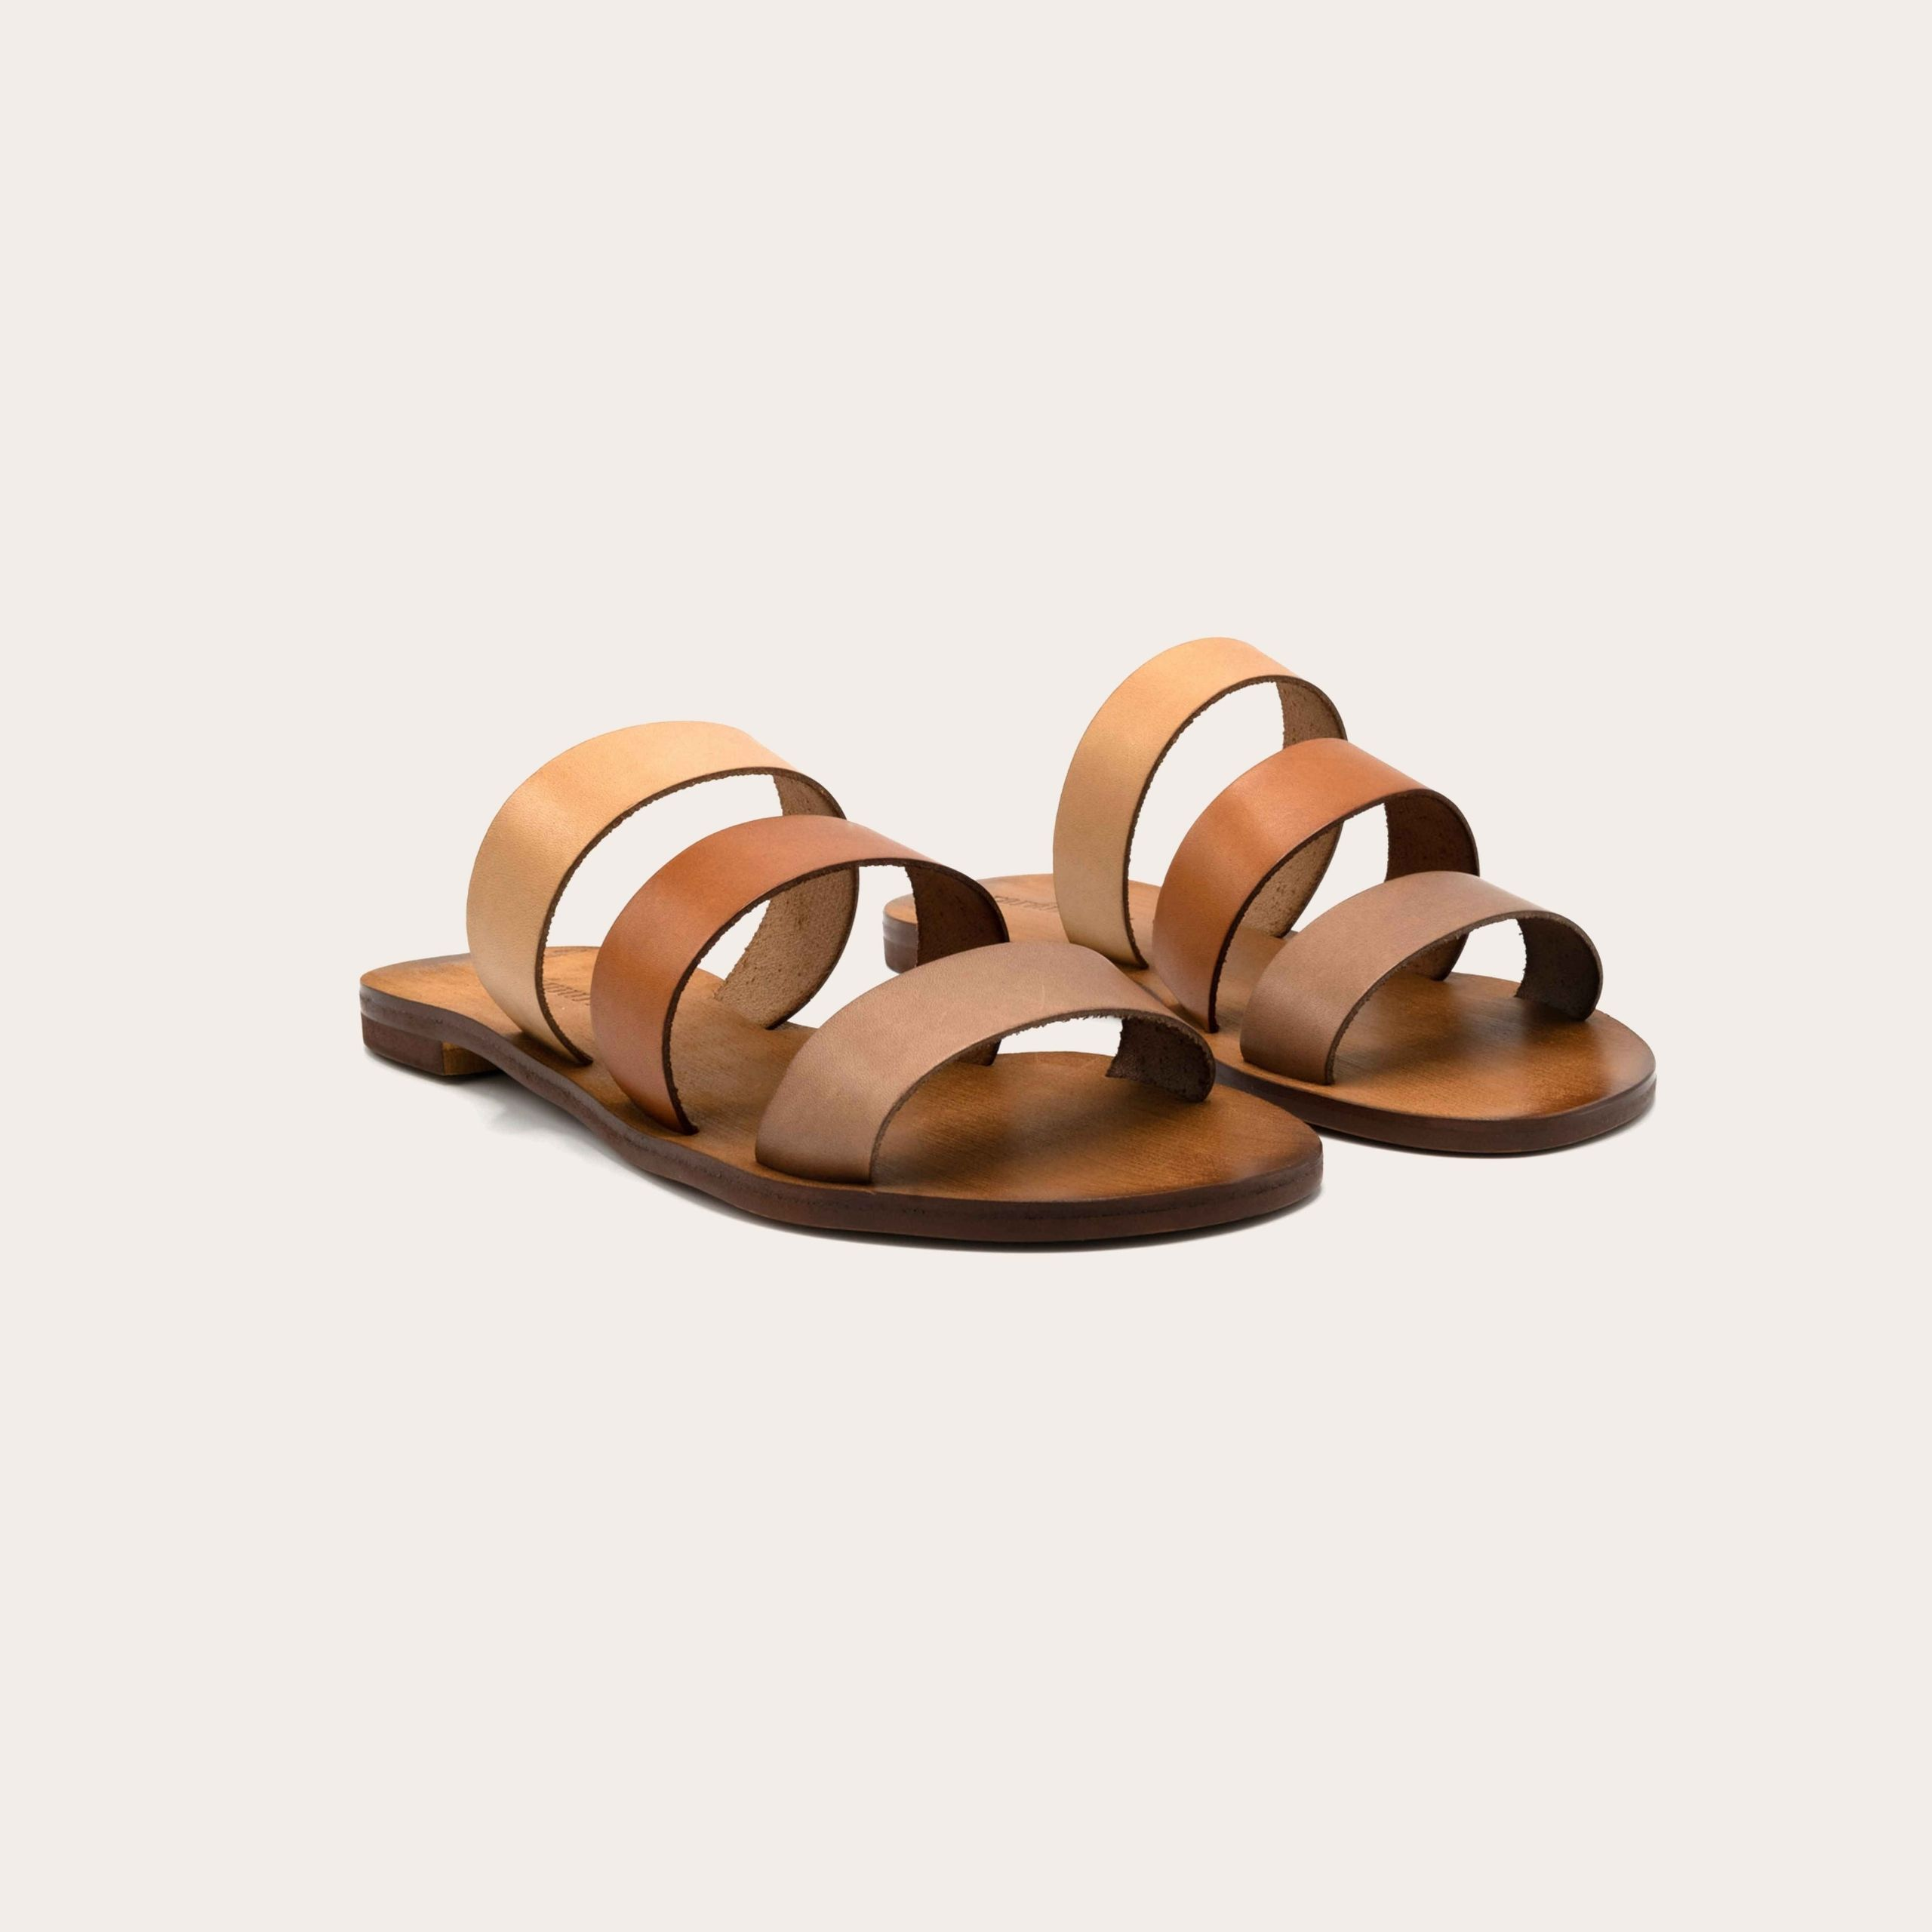 tijuana_2_lintsandalen sandals travelsandals vegan sustainable sandals wikkelsandalen